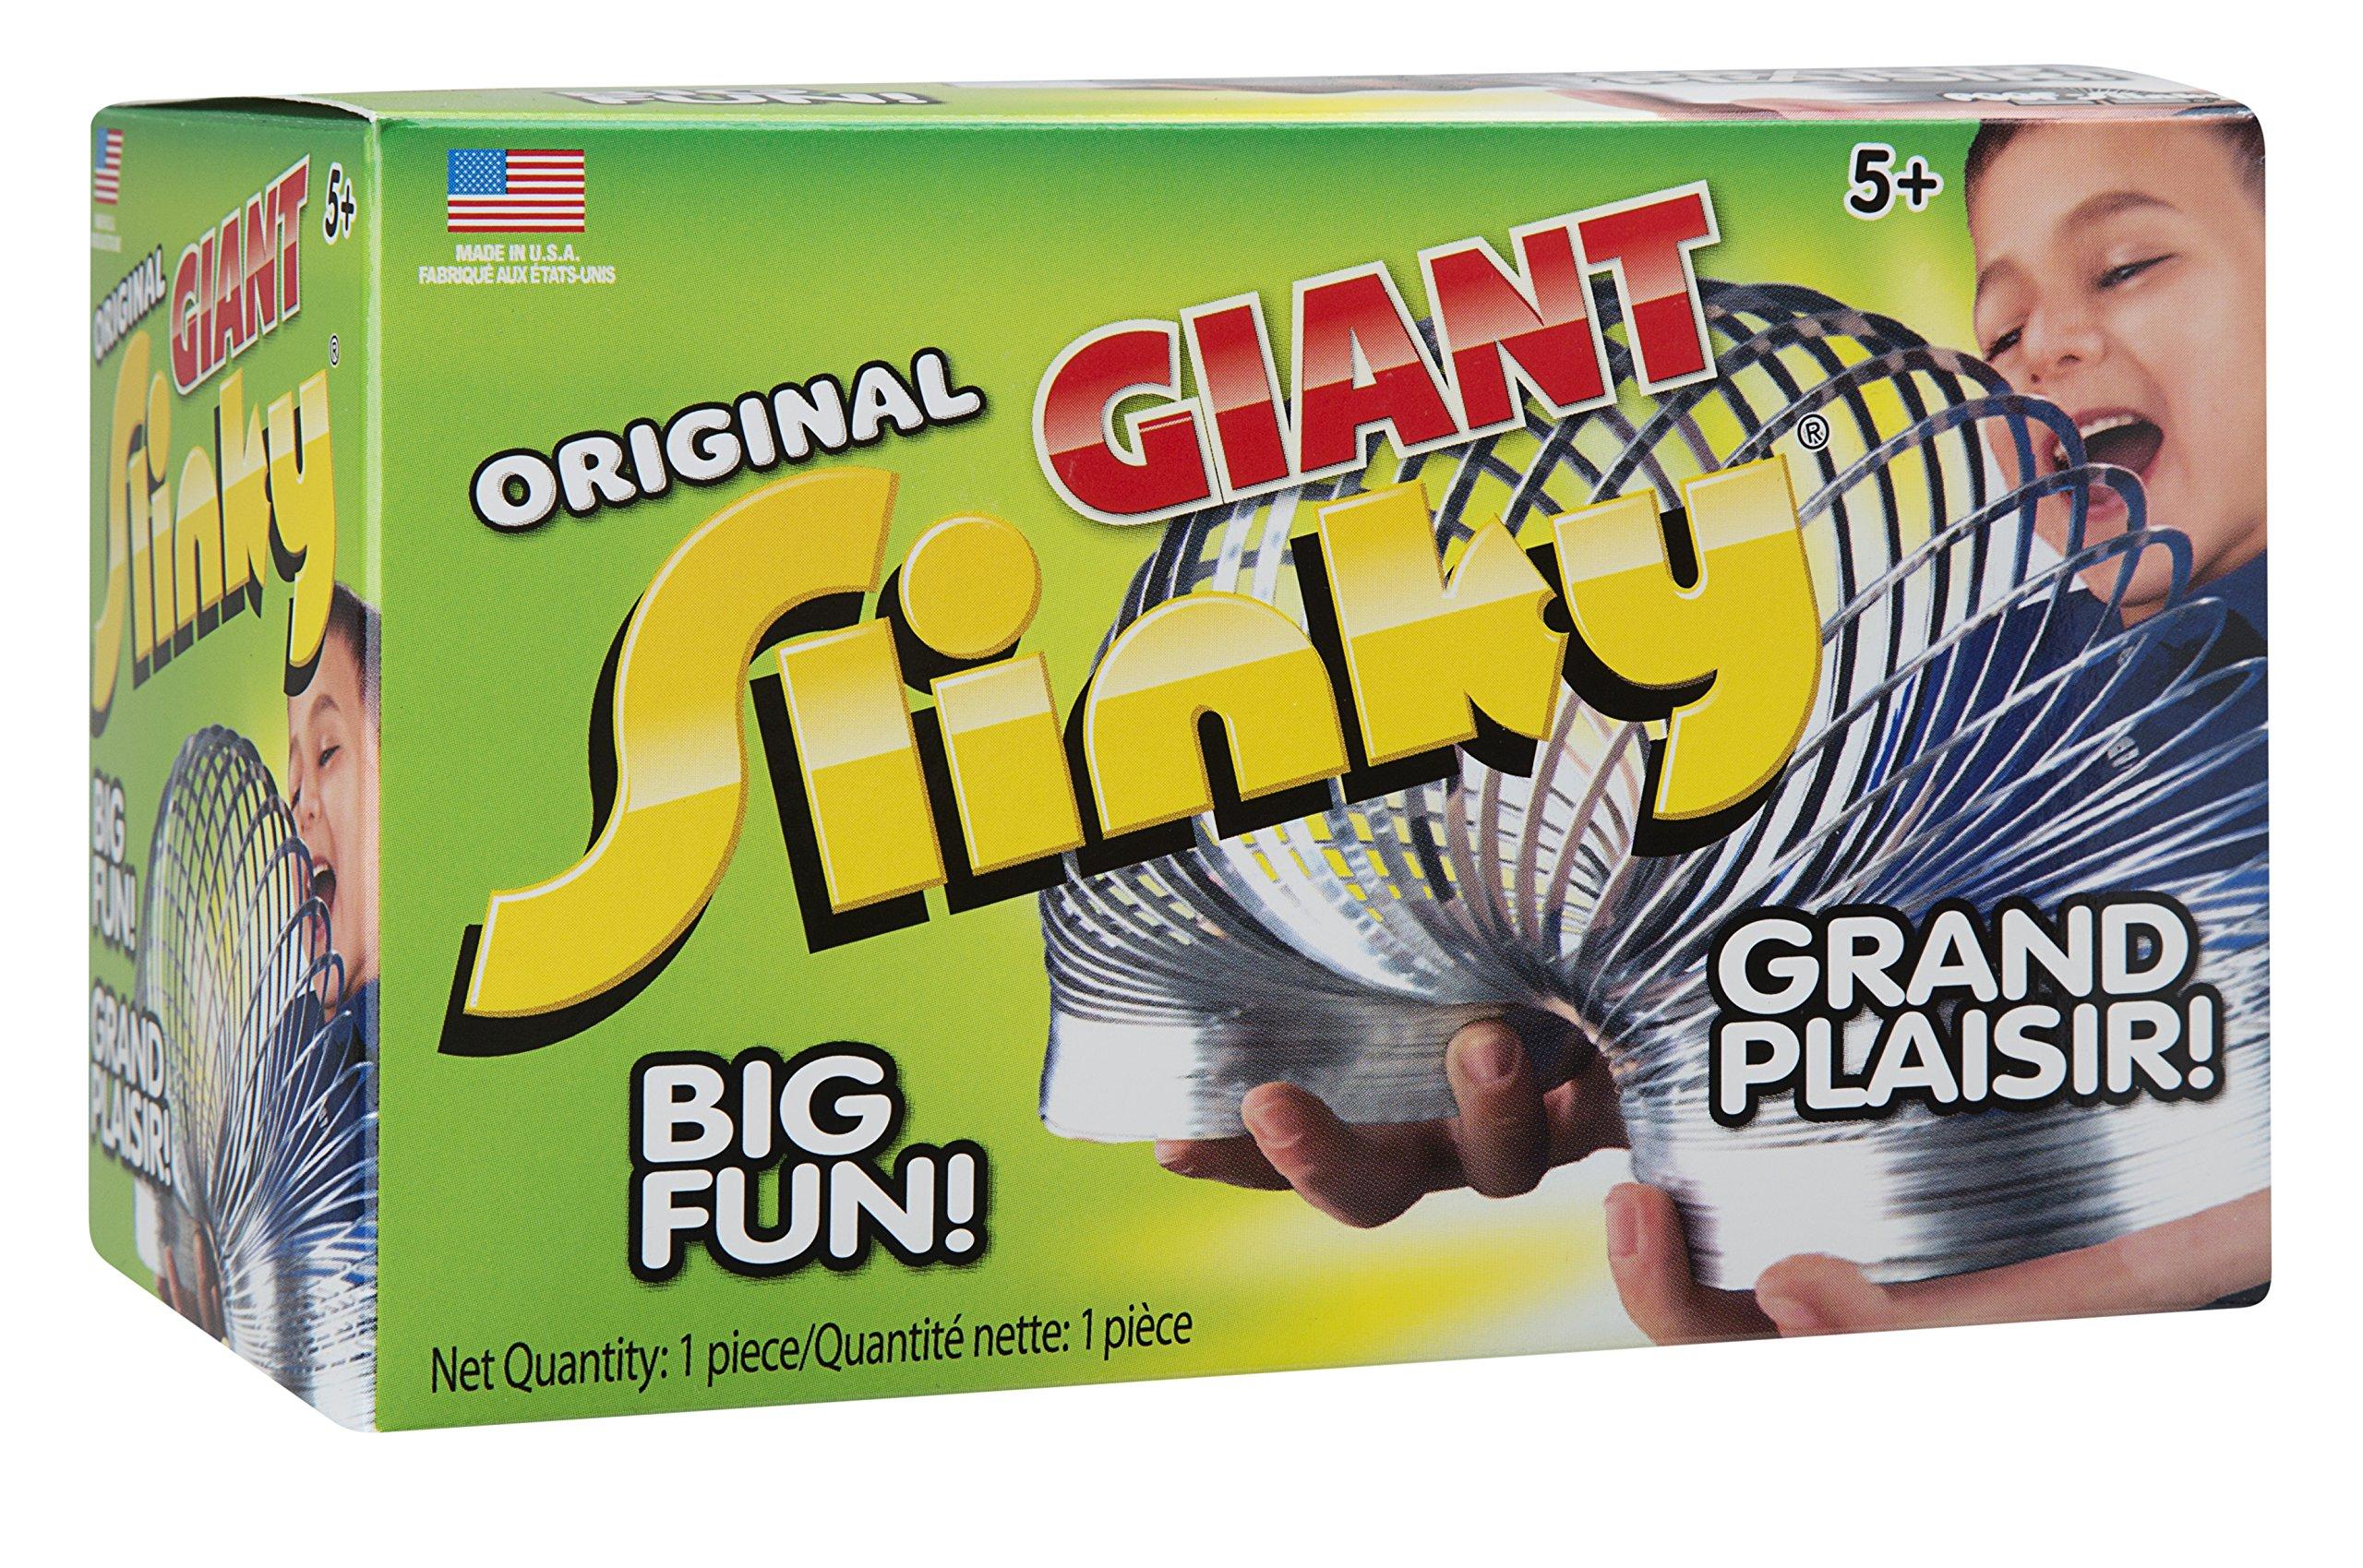 Slinky The Original Brand Giant Metal